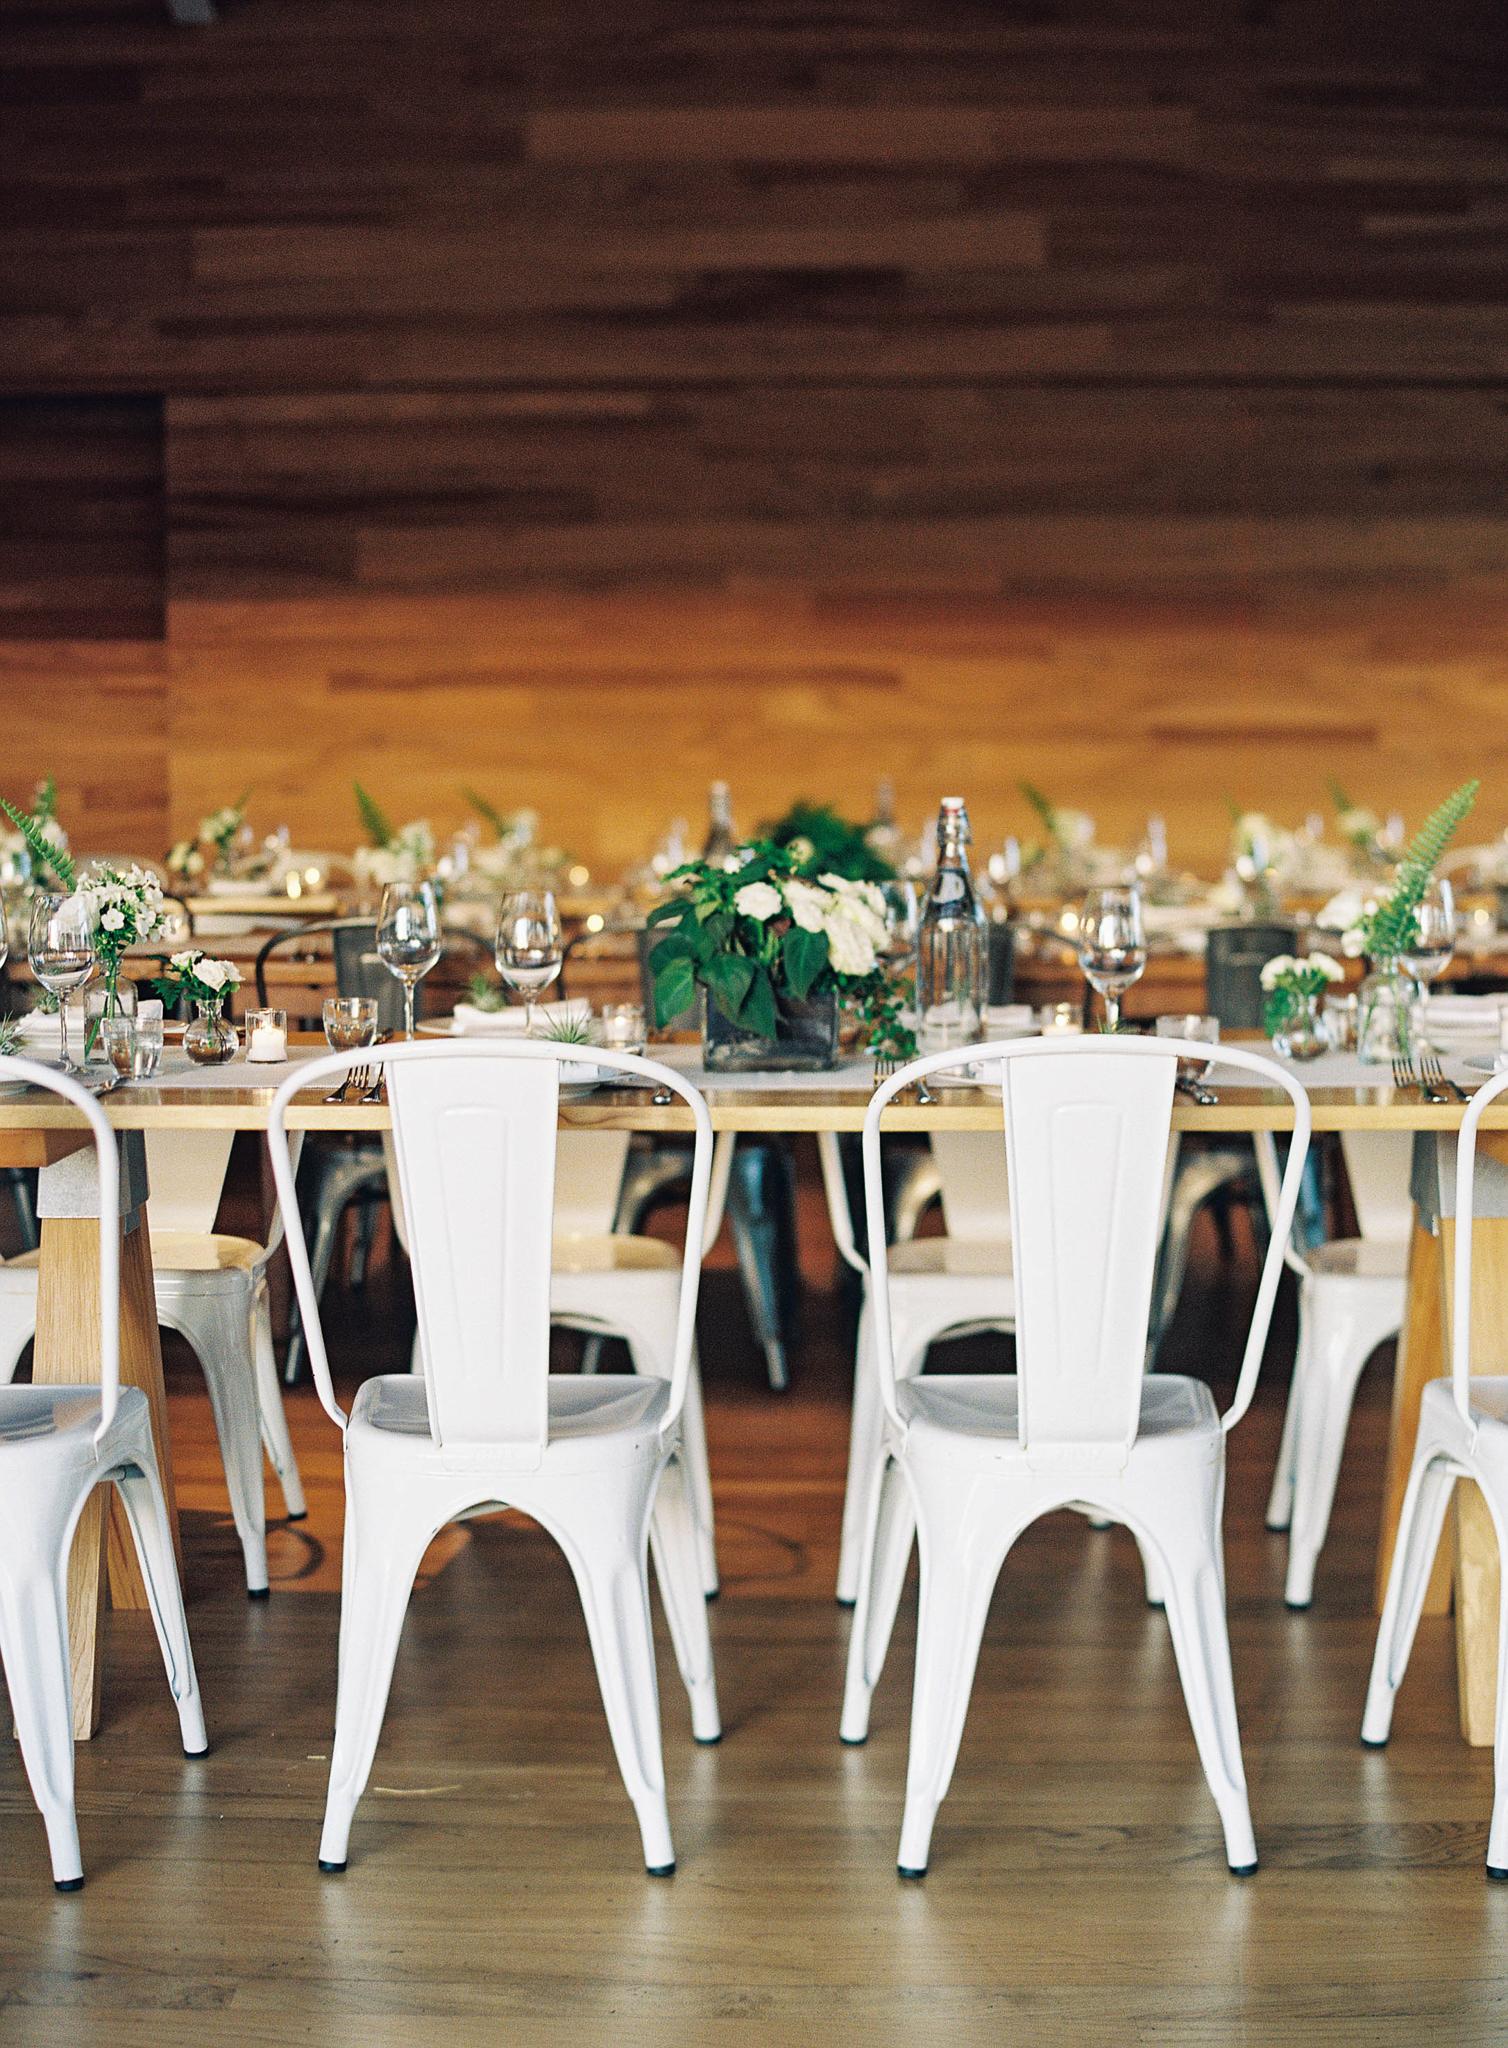 Meghan Mehan Photography - Fine Art Film Wedding Photography - San Francisco   Napa   Sonoma   Big Sur   Chicago   Minneapolis   Milwaukee   Lake Geneva   Door County   Wisconsin 069.jpg